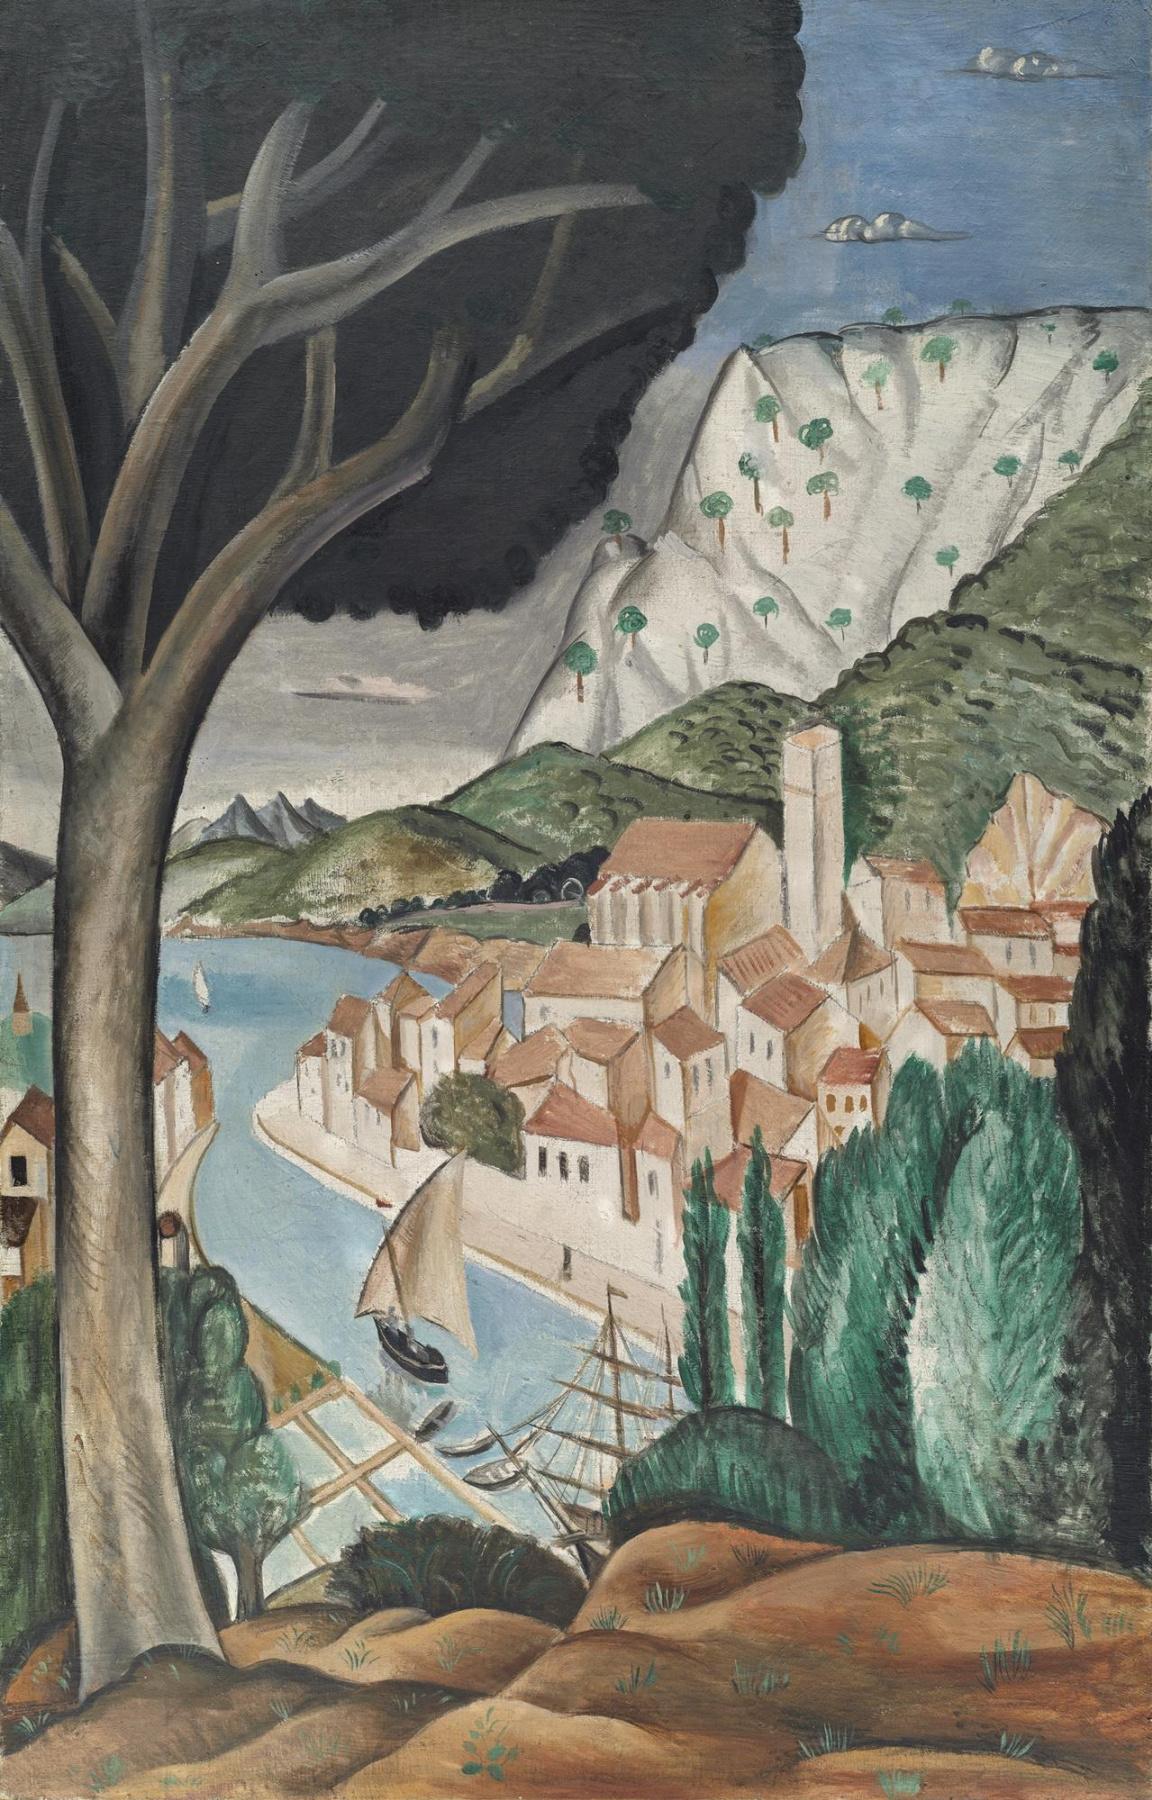 Andre Derain. Martigues (Harbor in Provence)